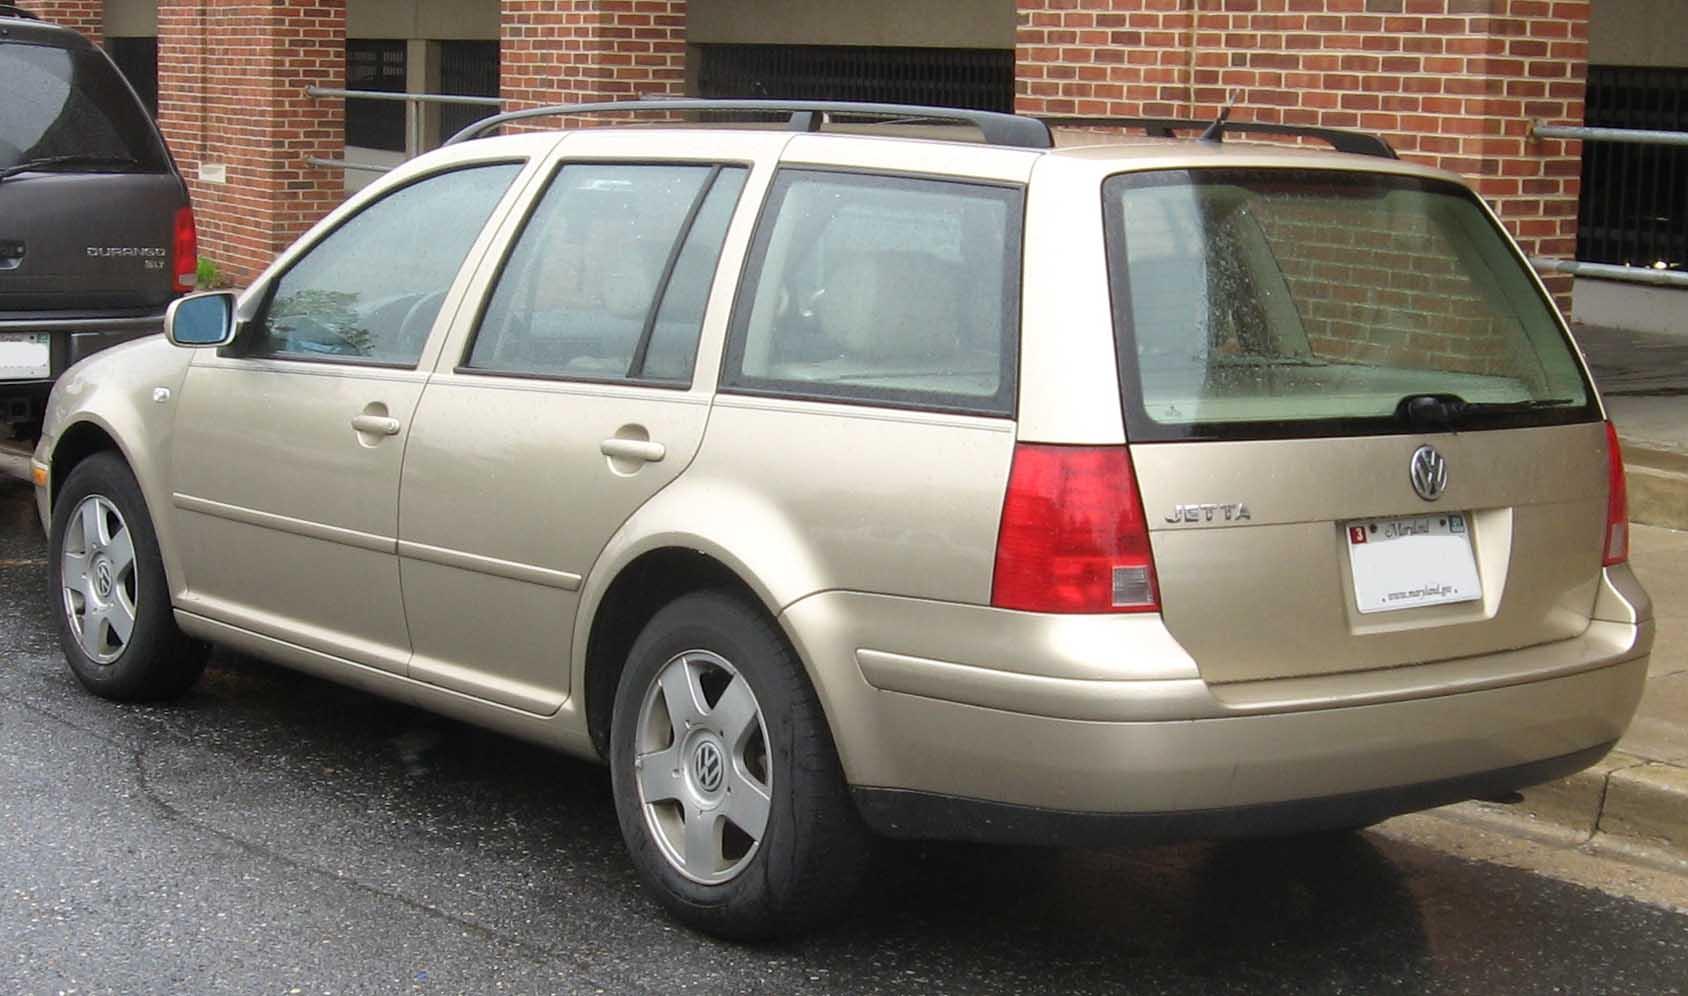 Wagon Vs Hatchback Cars